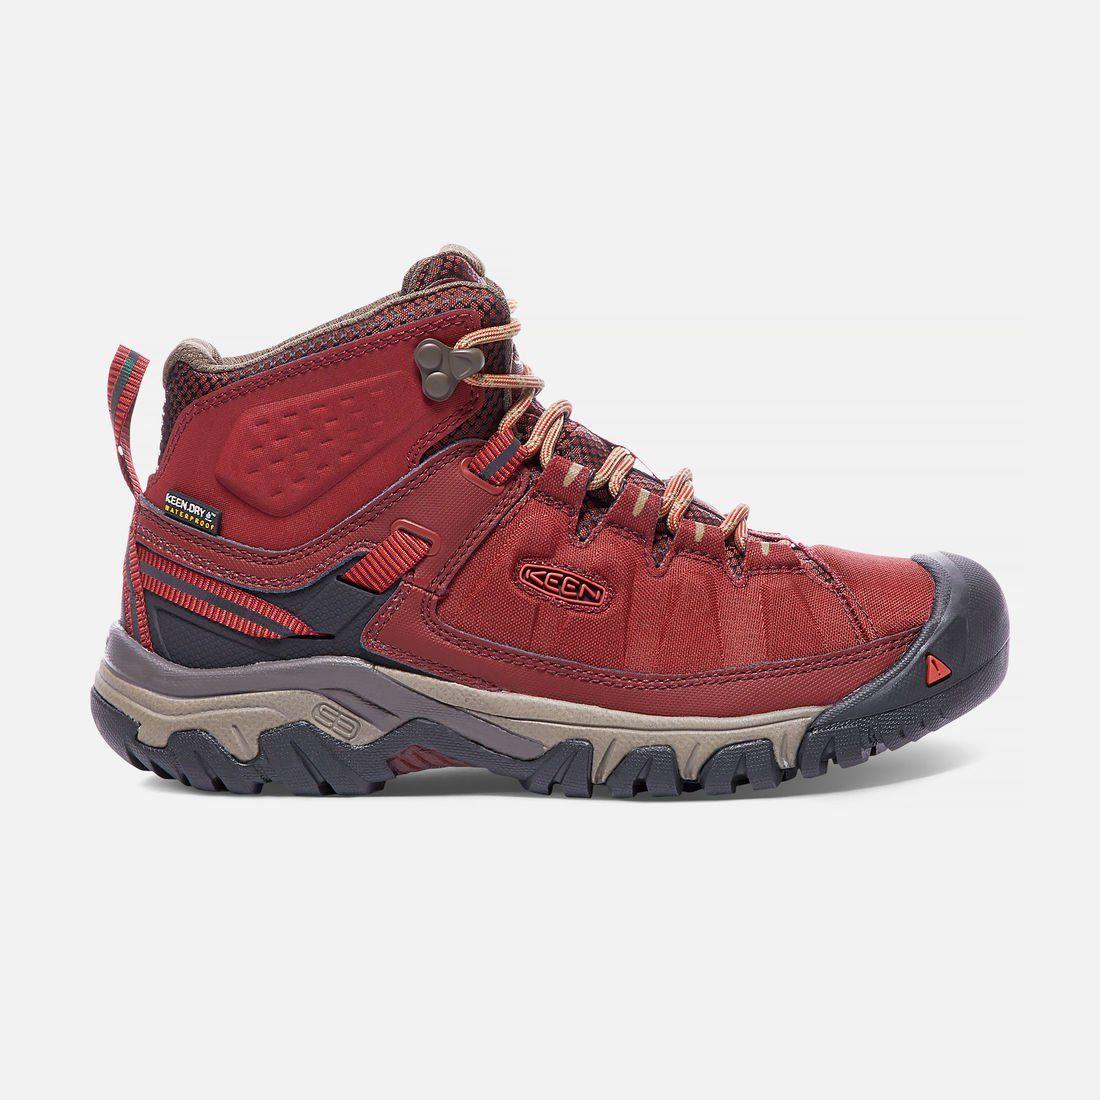 78e975295f4 Keen Footwear Women s Targhee Waterproof Mid Hiking Boot - Ethical Hiking  Boots